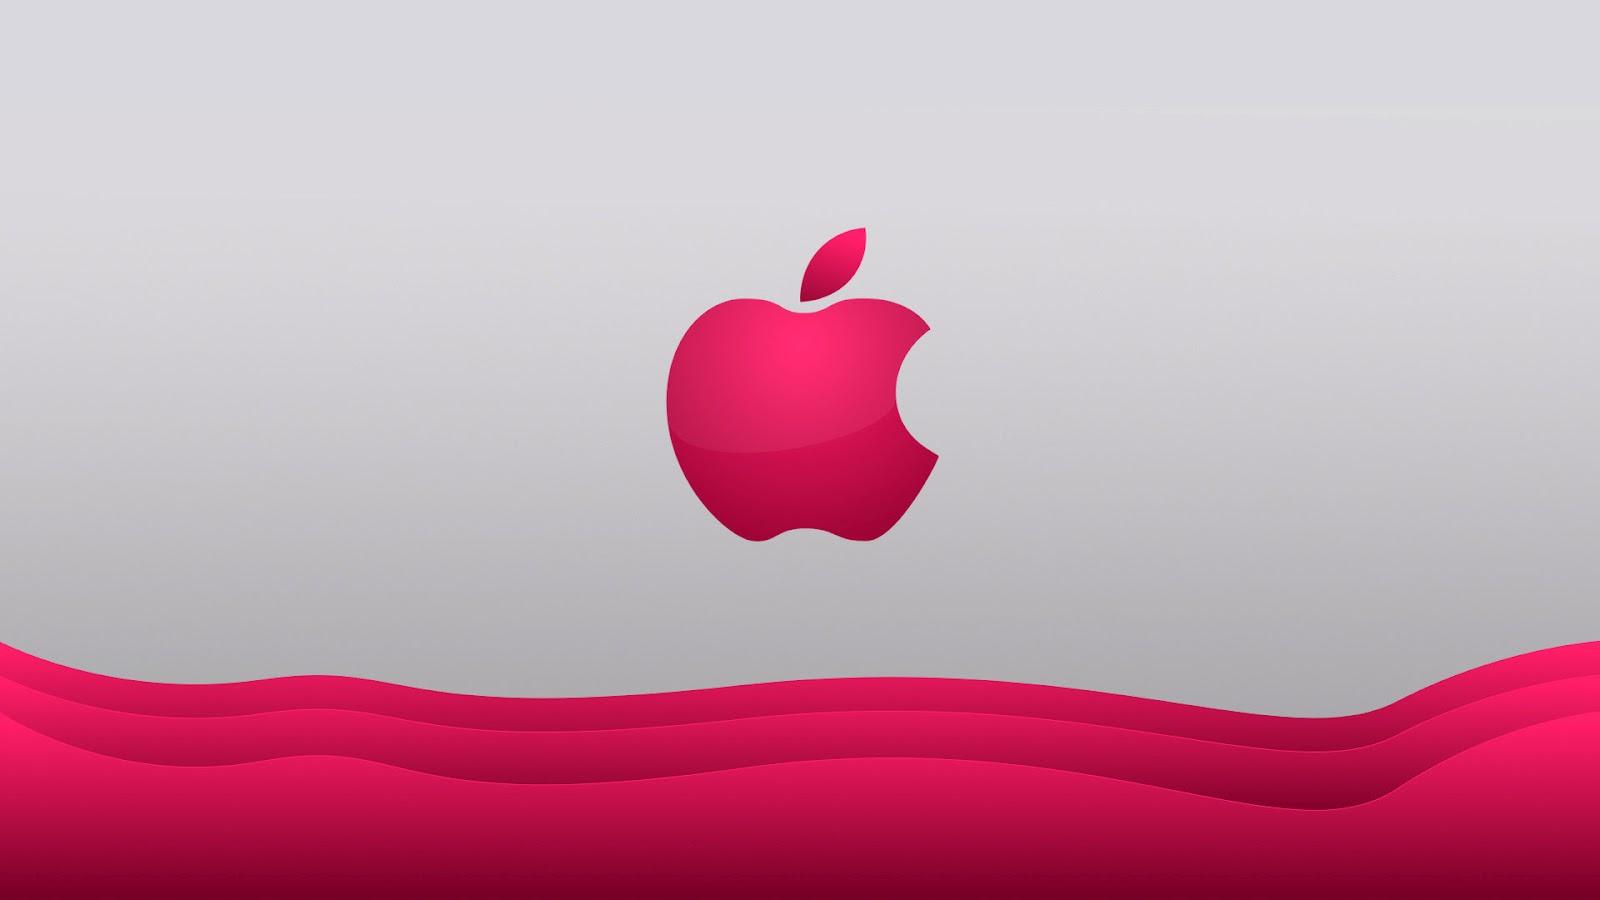 10 108598 wallpaper cantik apple background pink